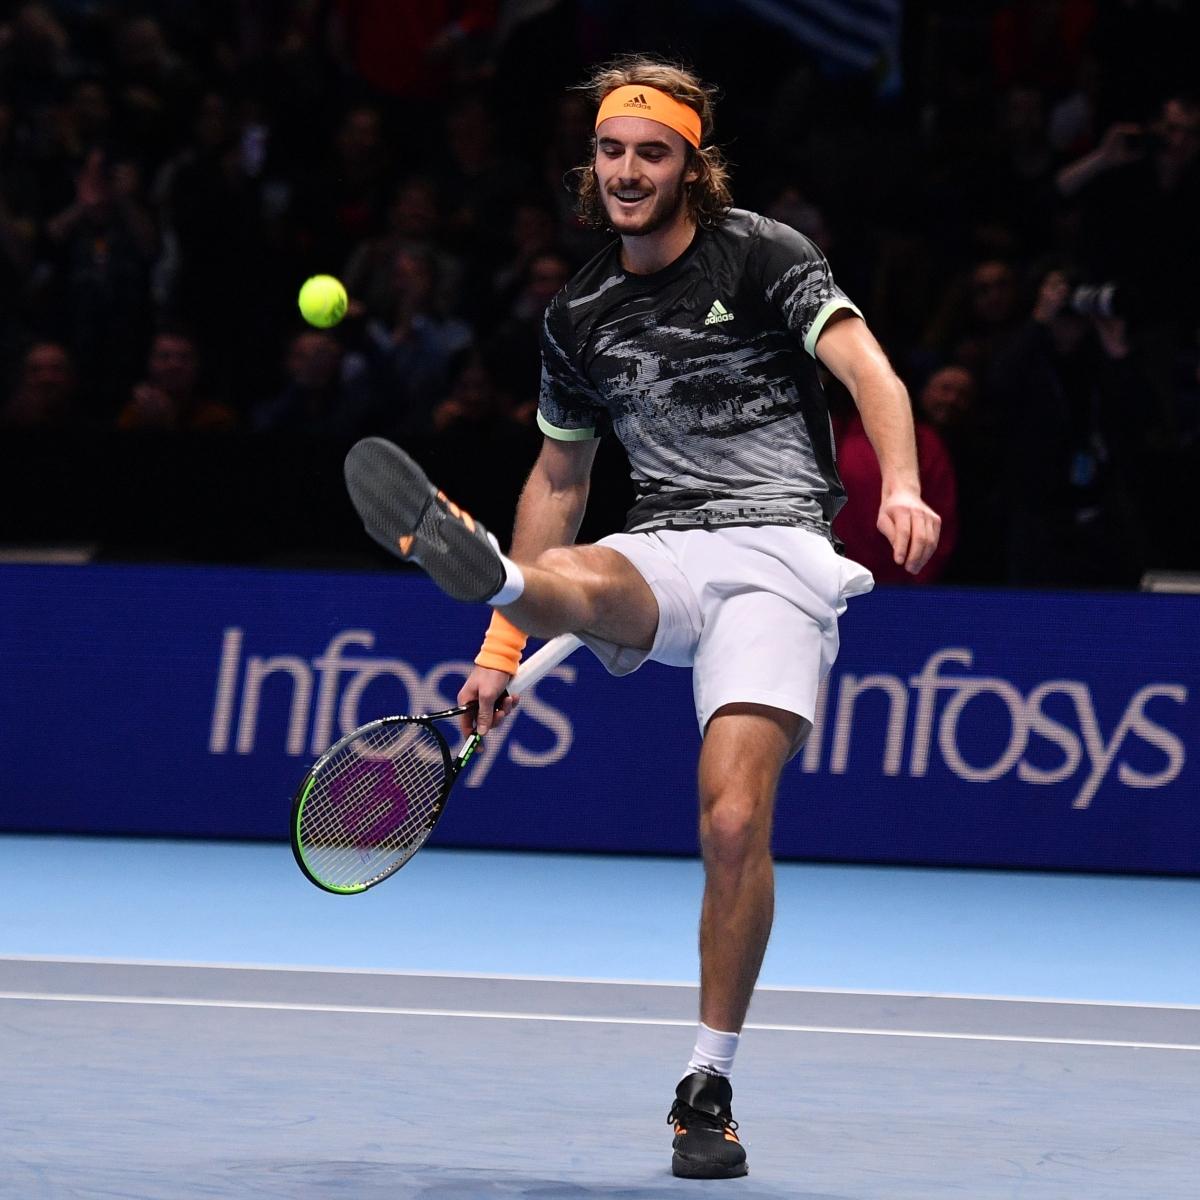 ATPFinals: Roger Federer stunned, loses Stefanos Tsitsipas